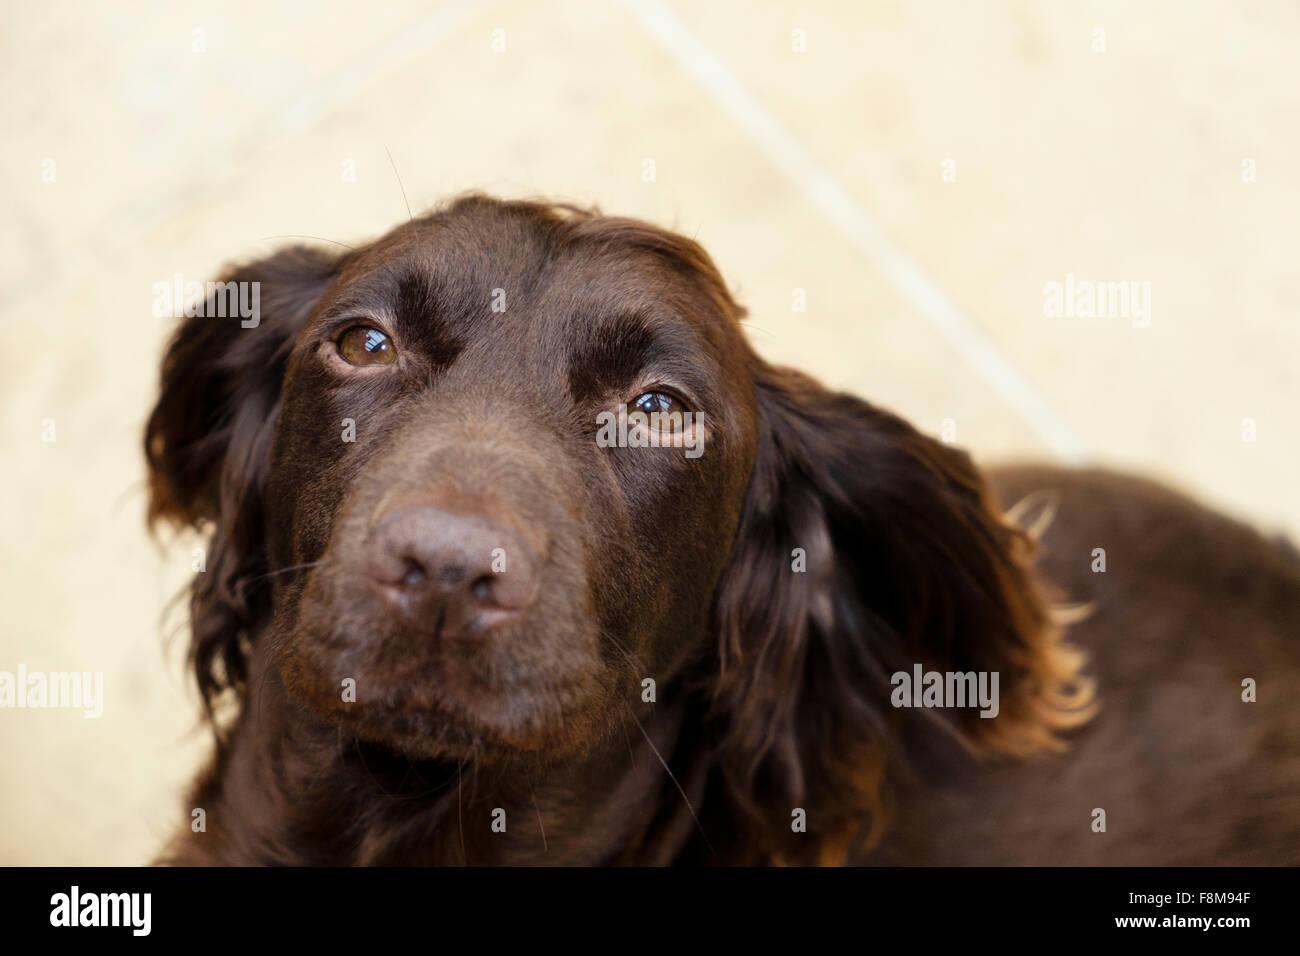 Chocolate brown (liver) English Cocker Spaniel pet dog ...